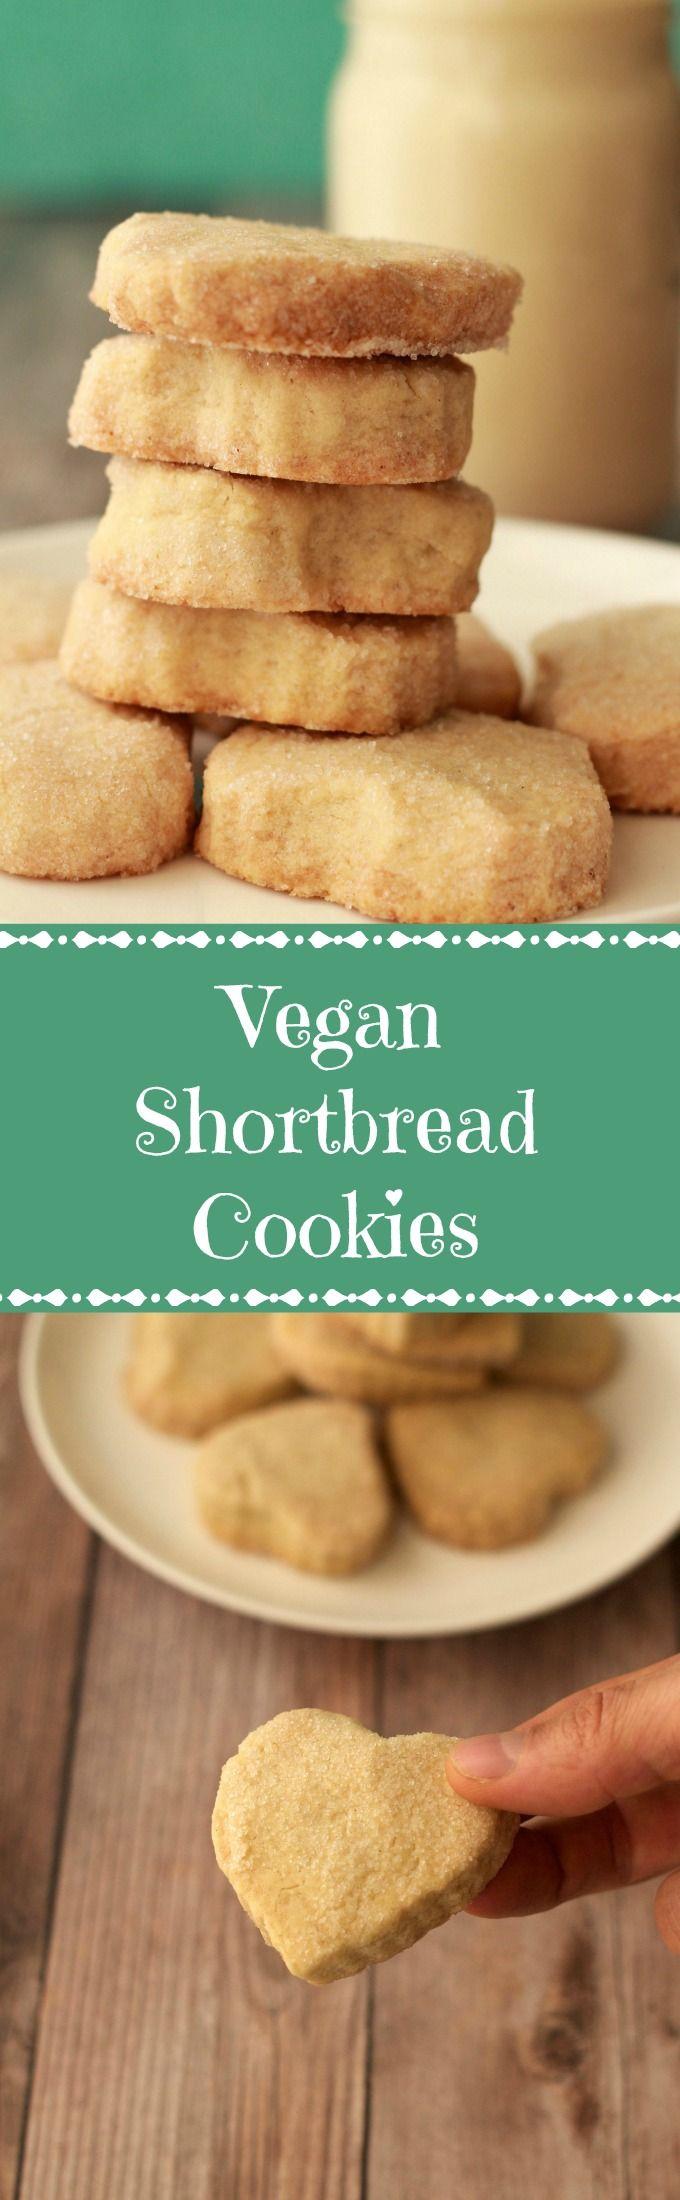 Vegan Shortbread Cookies #vegan #lovingitvegan #shortbreadcookies #dairyfree #dessert